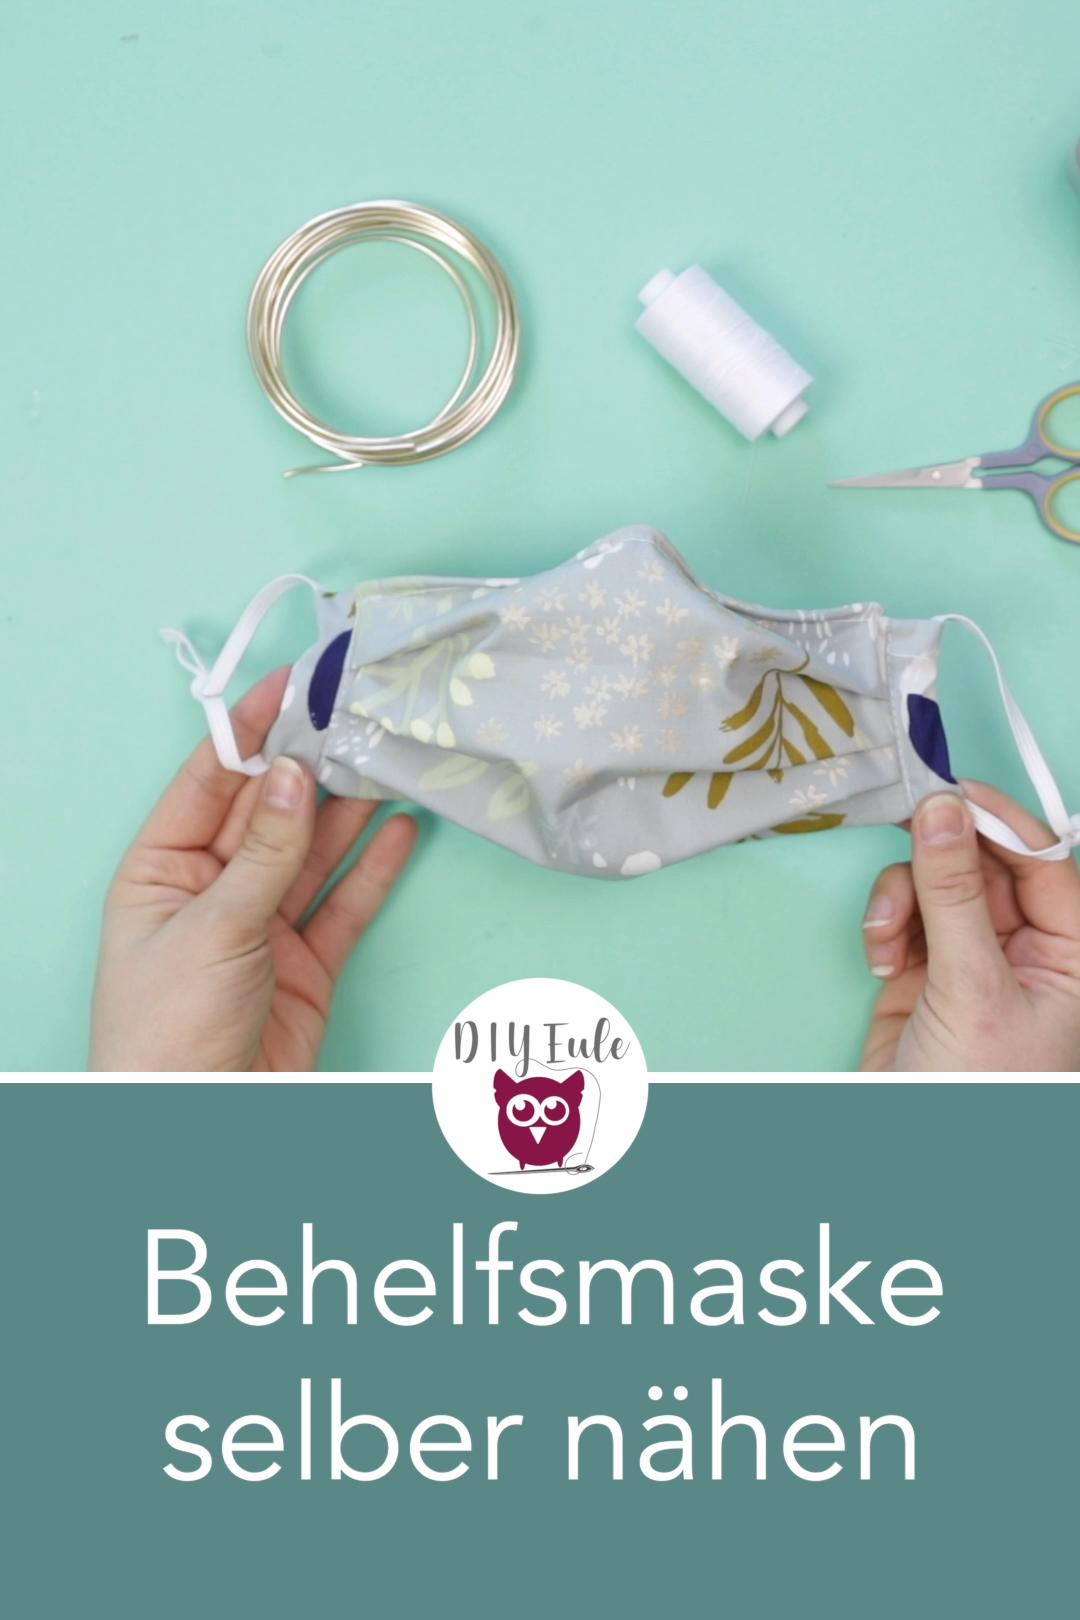 Behelfsmasken selbst nähen in 2020 Masken selber basteln